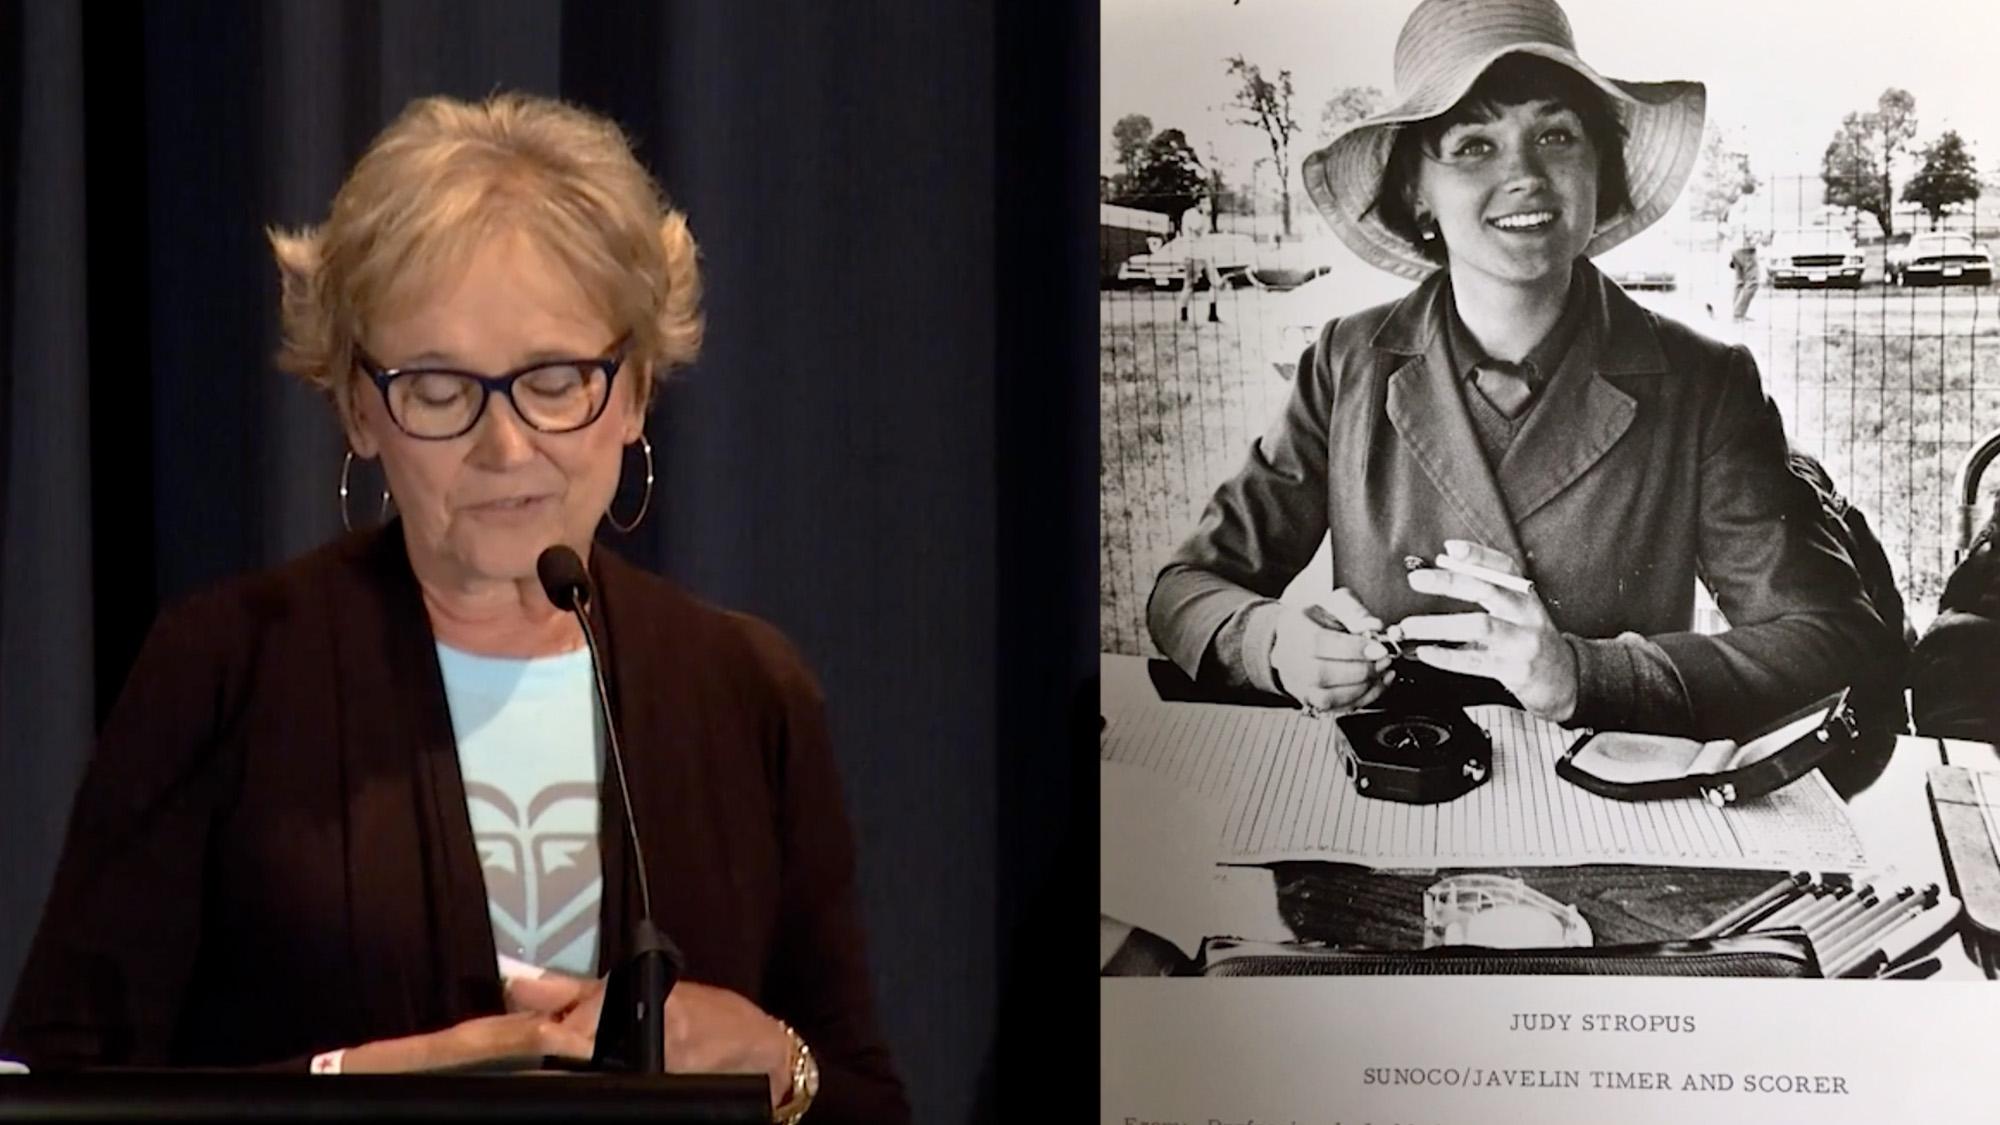 Judy Stropus video